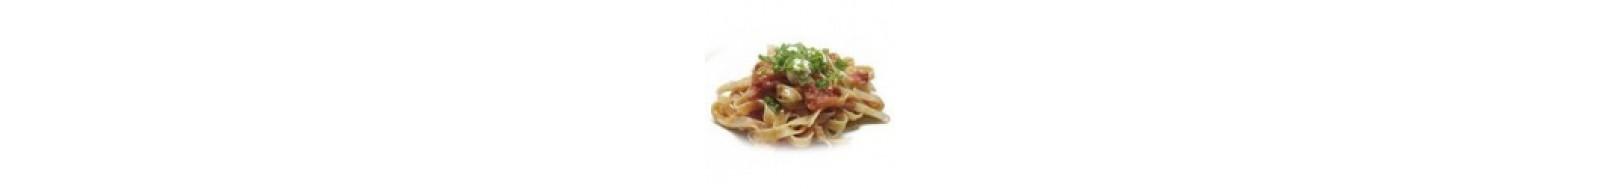 Pasta al Fileto (Tomate con Trozos de Tomate Fresco y Albahaca)